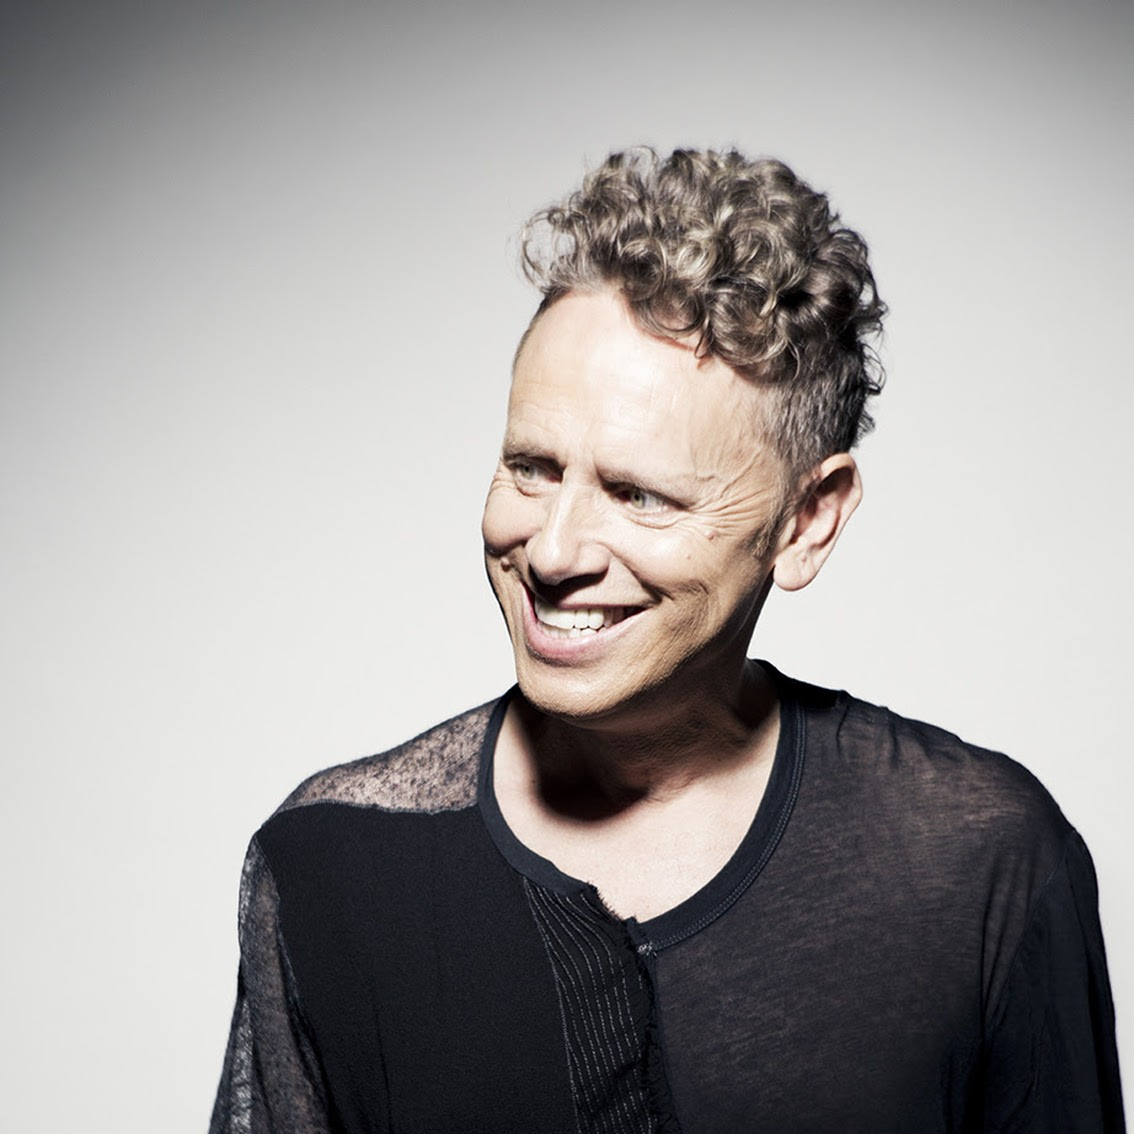 Depeche Mode songwriter Martin Gore sees 'Europa Hymn' remixed by Andy Stott - listen here!